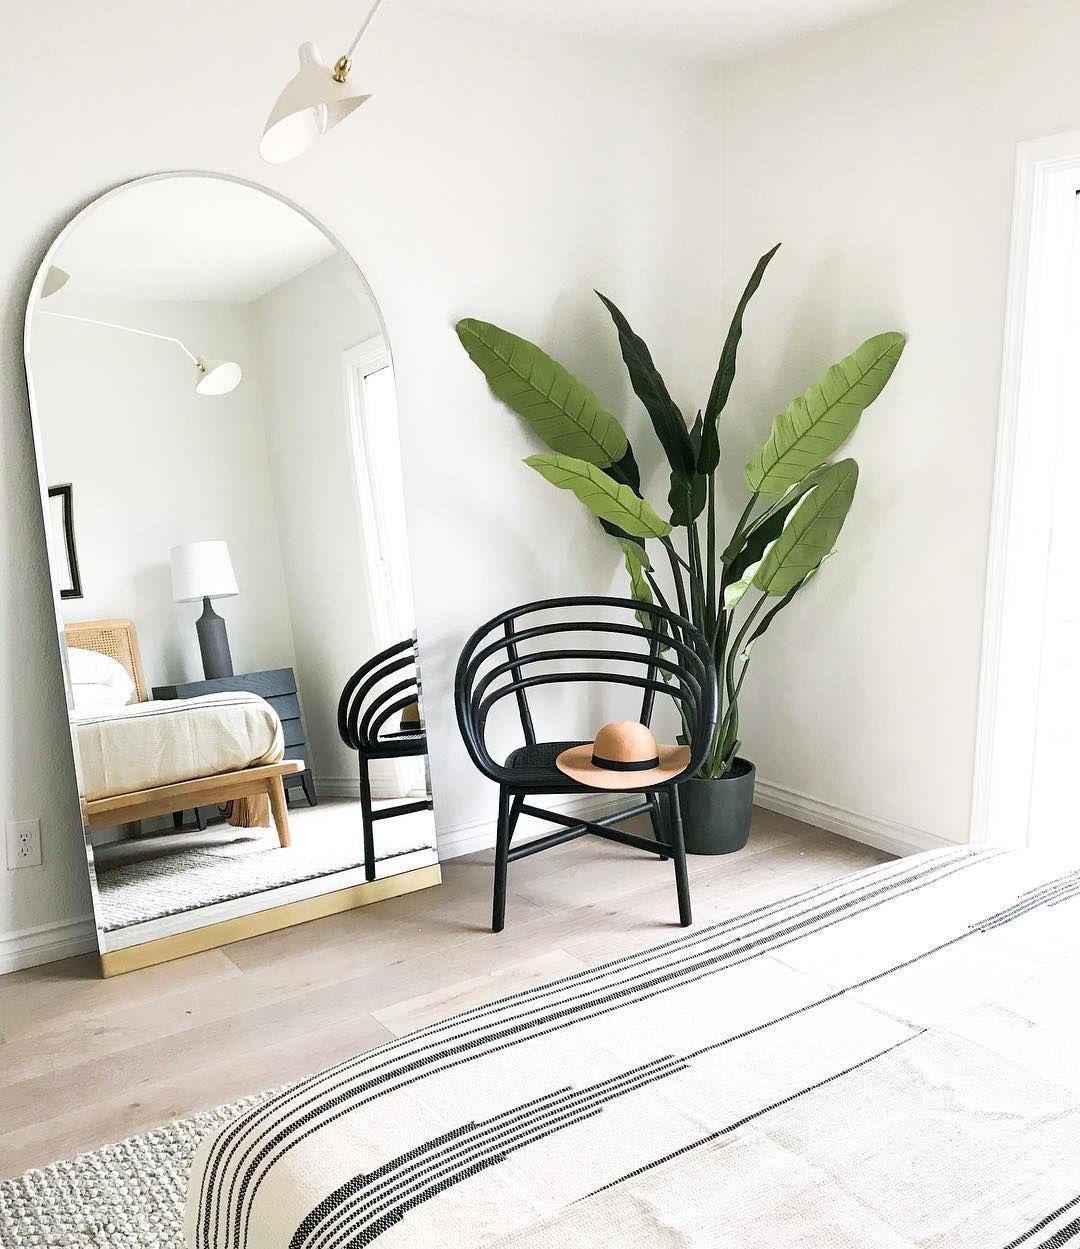 Floor Mirror Decorating Ideas That Will Improve Your Space Minimalist Bedroom Decor Modern Boho Bedroom Home Decor Bedroom